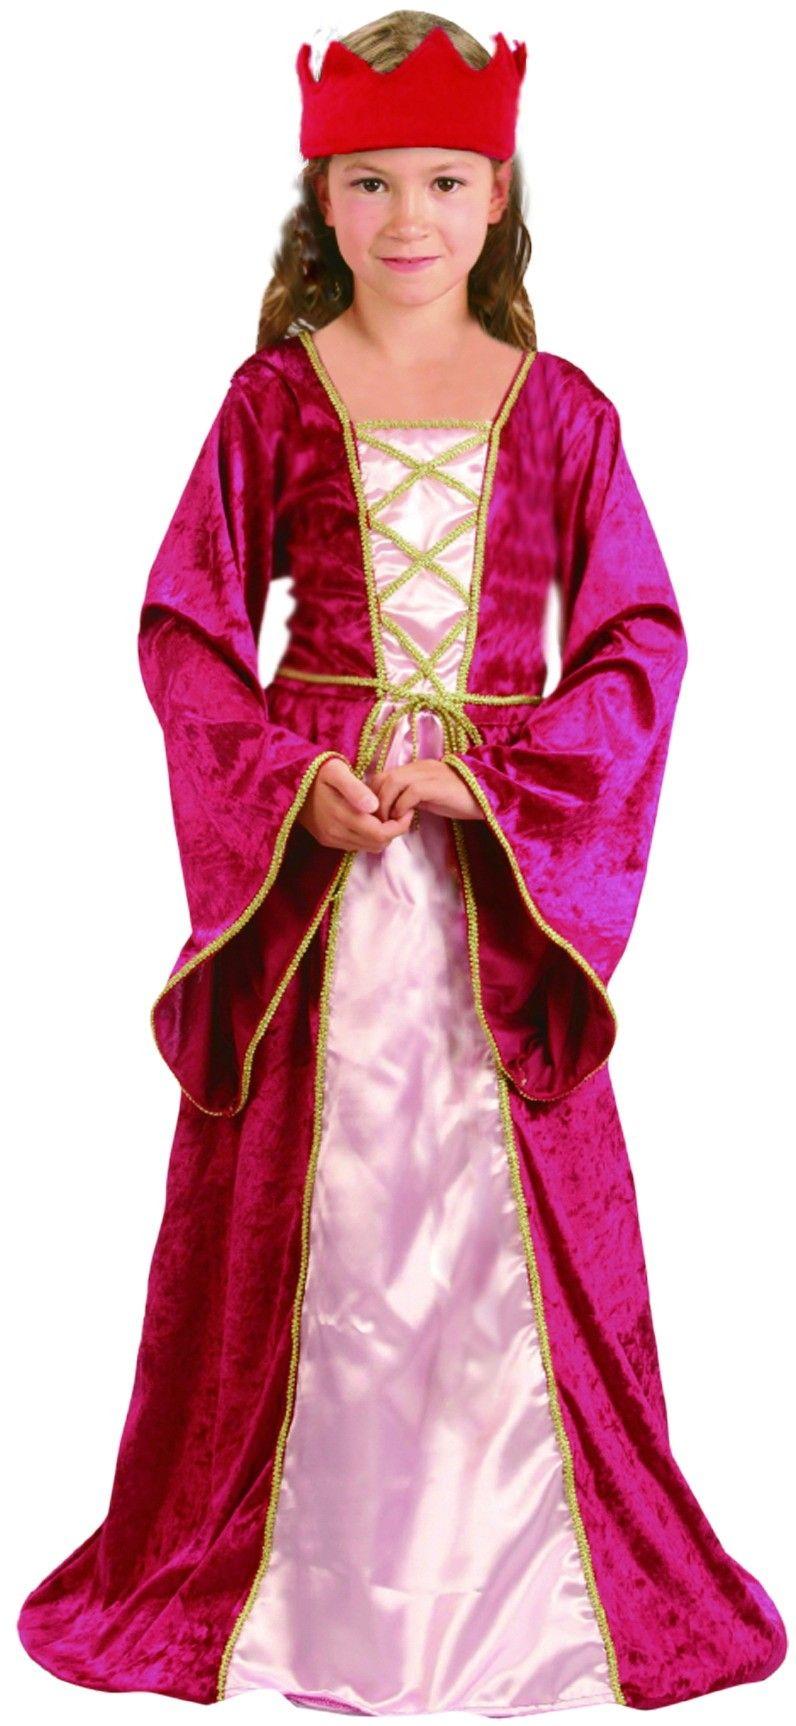 Disfraz de reina medieval para niña | Disfraces | Pinterest ...